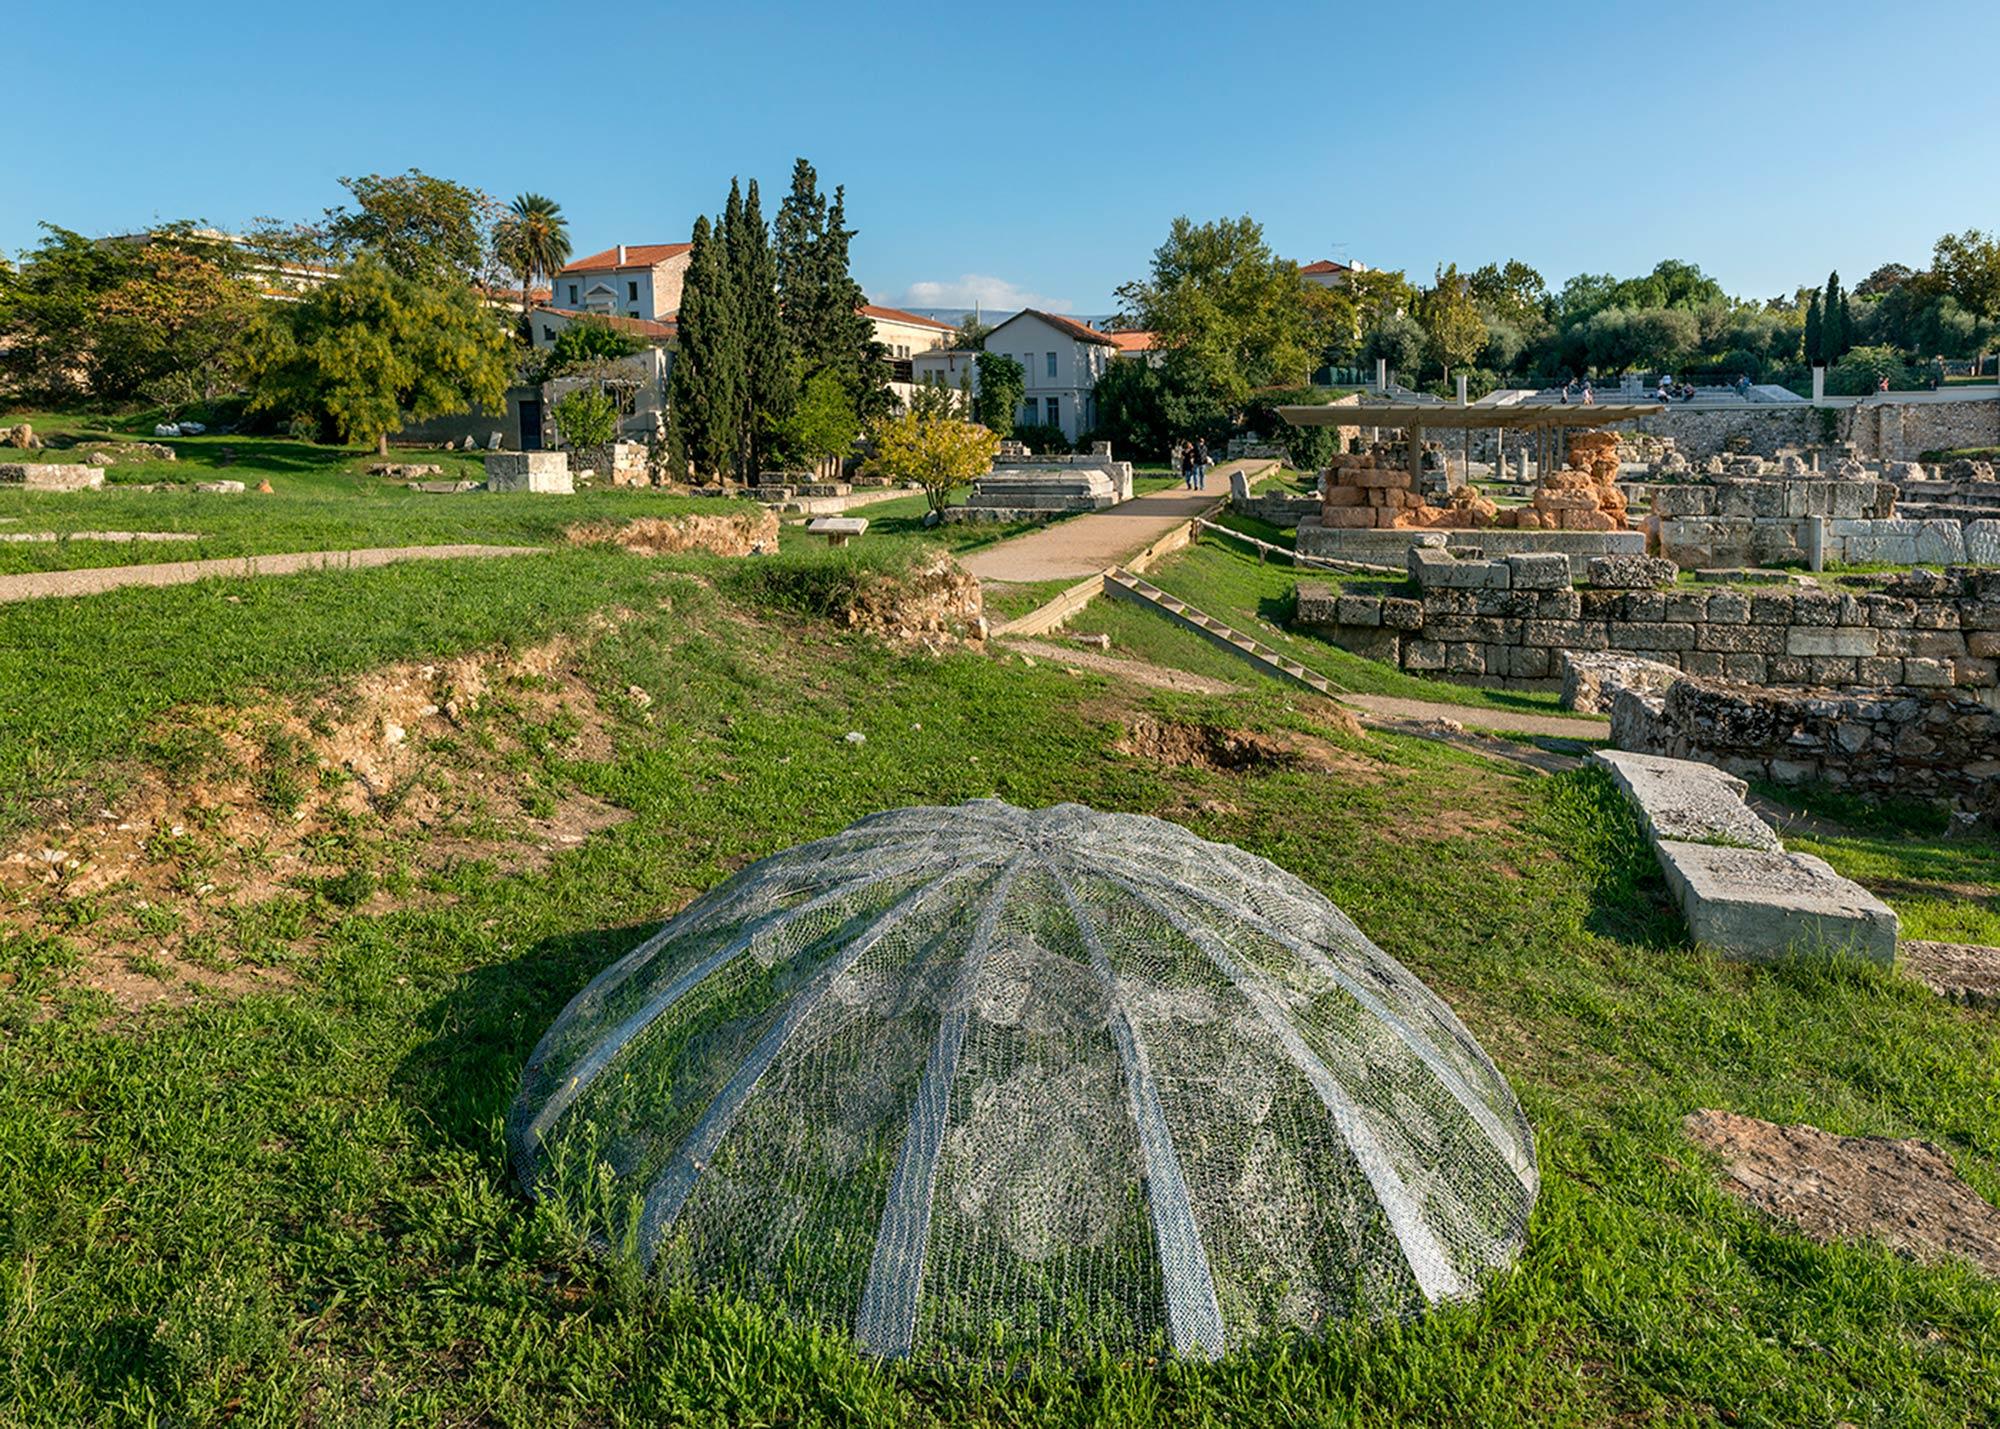 Installation View | CITY PROJECT 2015 | A TRANSFER | MARIA LOIZIDOU | Photo Panos Kokkinias | Courtesy NEON